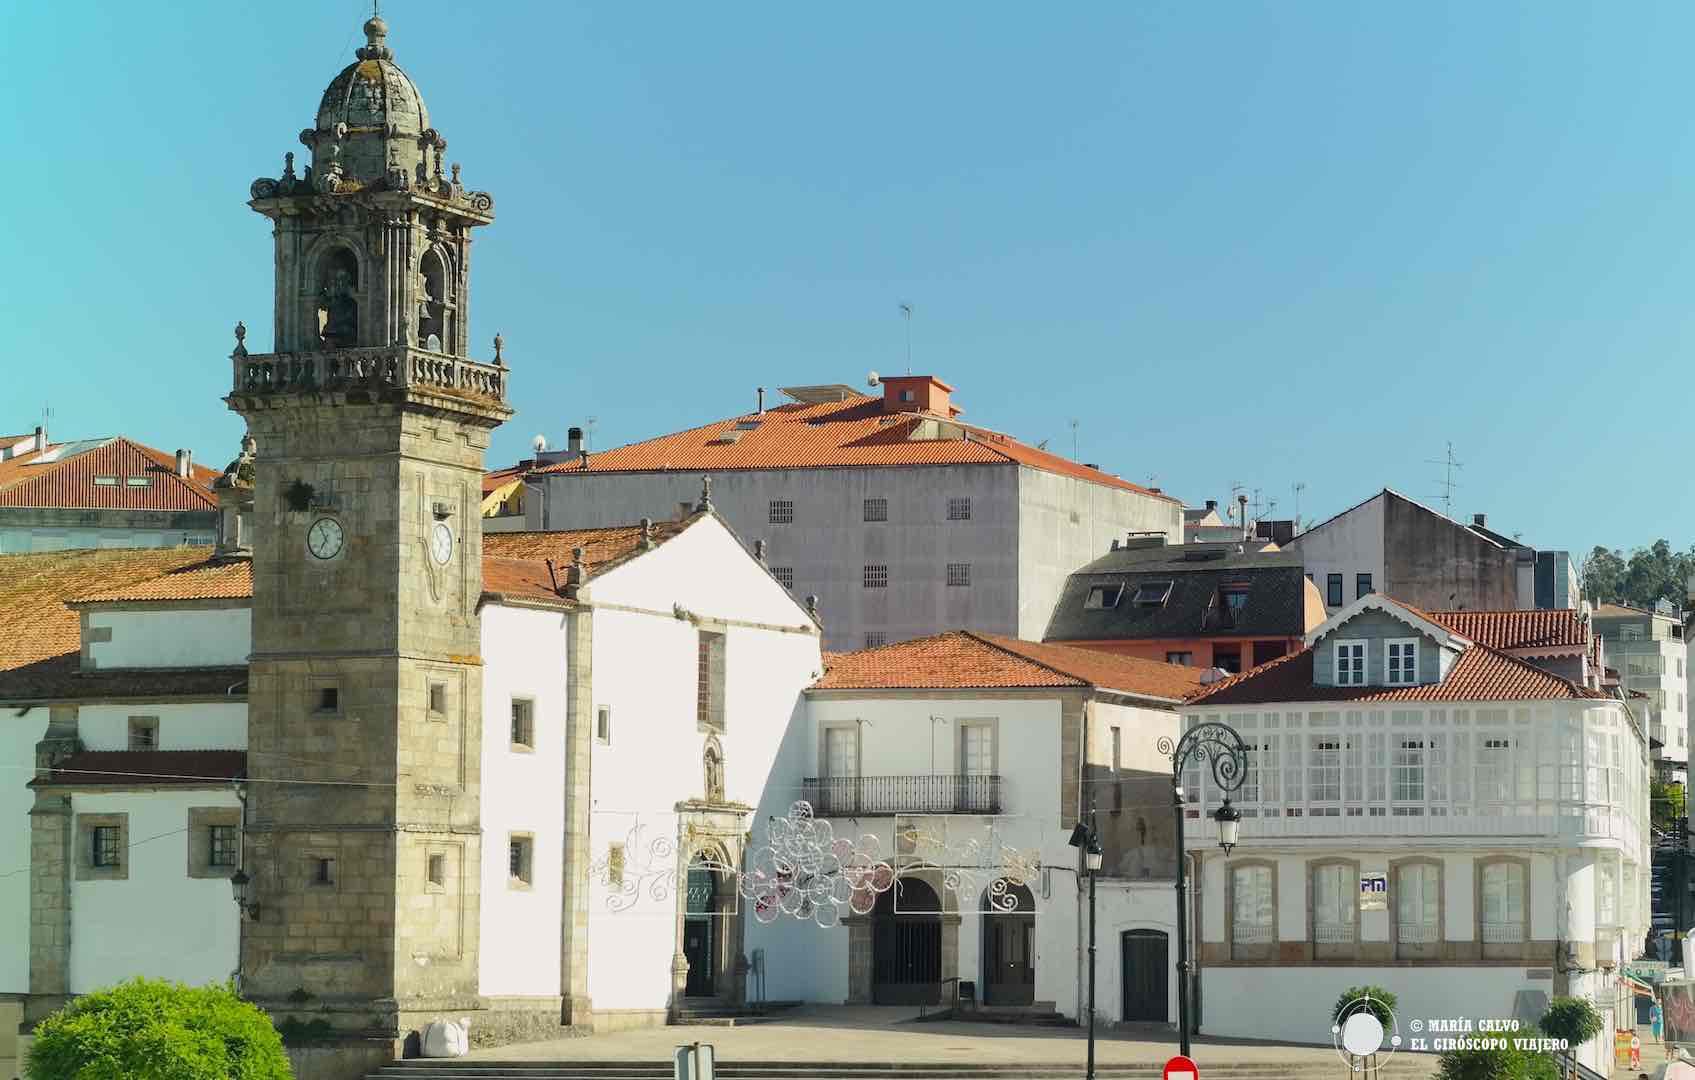 La inmensa plaza irmaos García Naveira